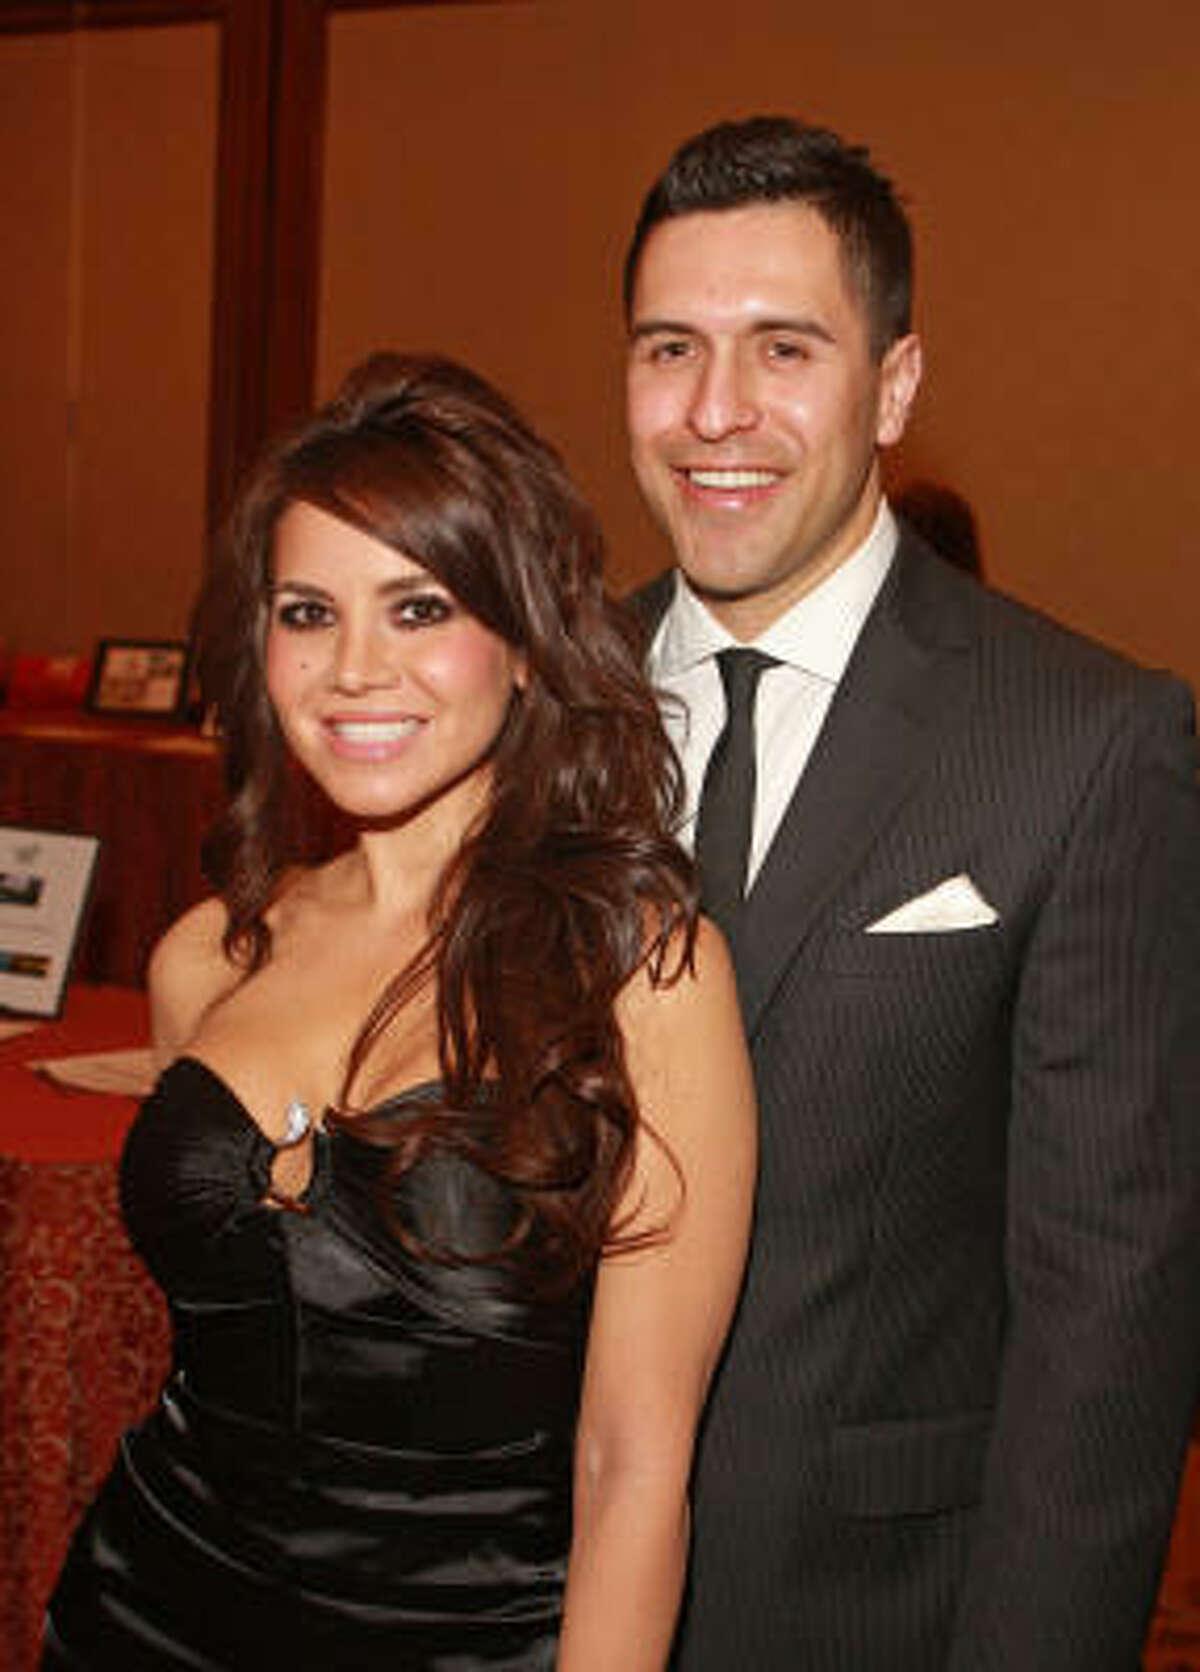 Corinne Rodriguez and Trae Mindiola